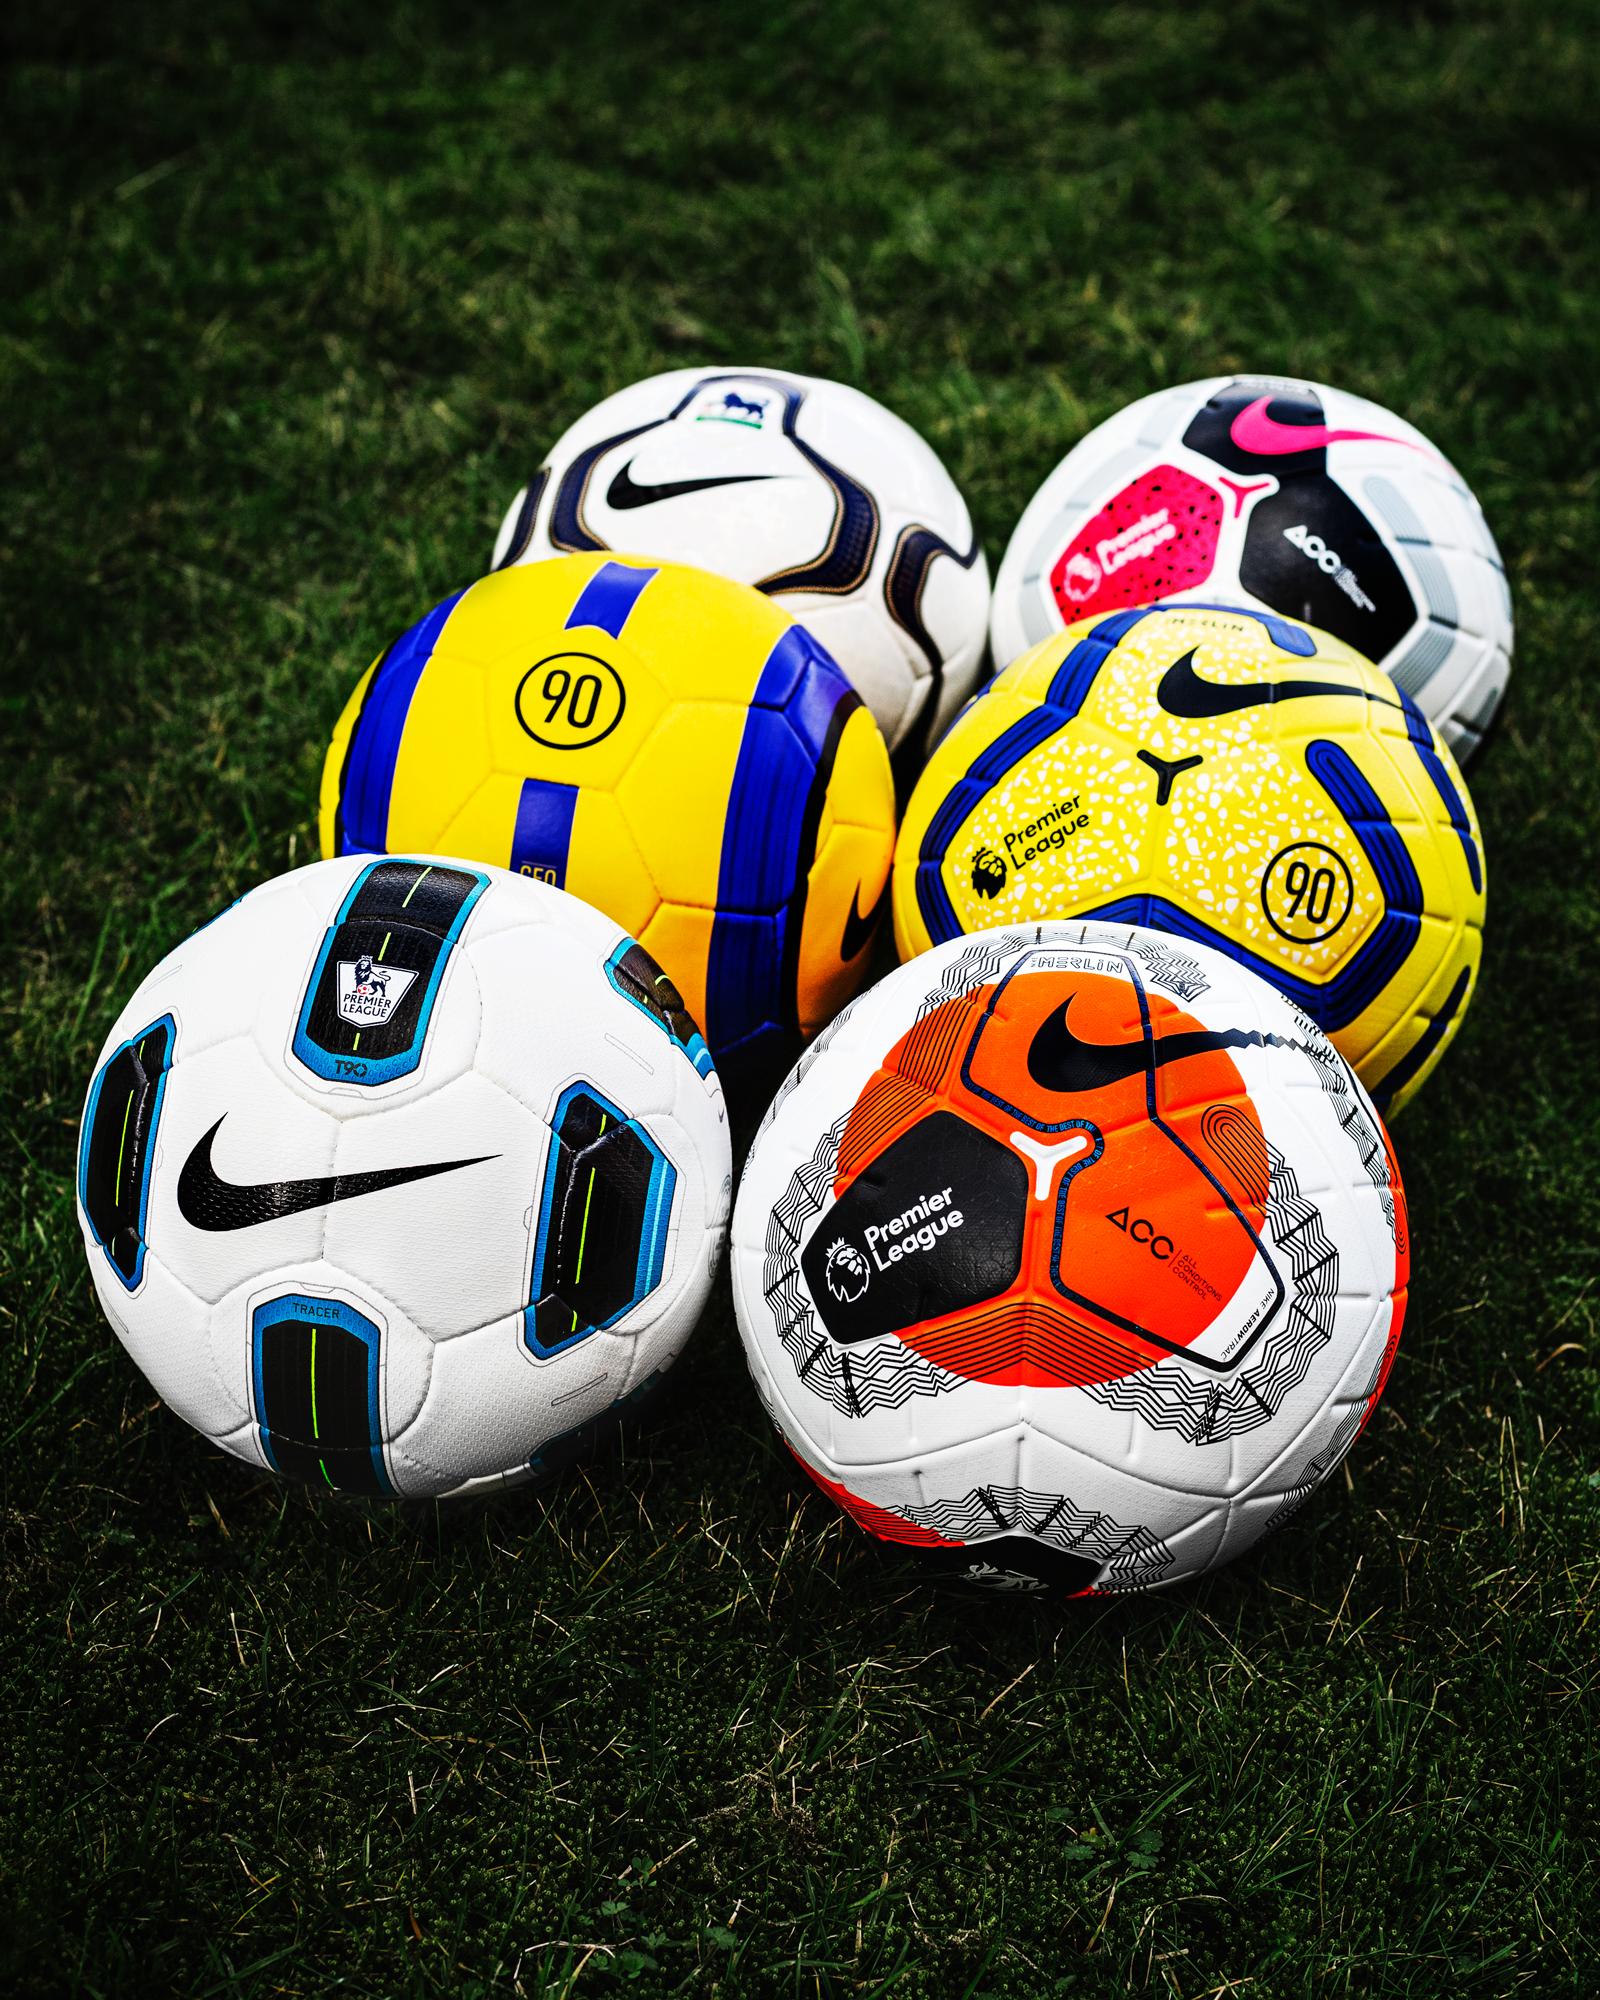 Nike Prem Balls Shop At Unisport Nike Football Soccer Ball Football